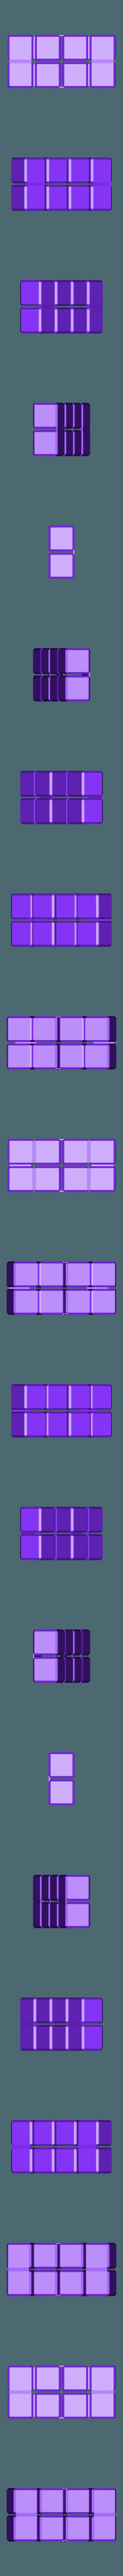 FlexibleCube20.stl Download free STL file Infinity Cube, Magic Cube, Flexible Cube, Folding Cube for Flexible TPU filament • 3D printing template, LGBU